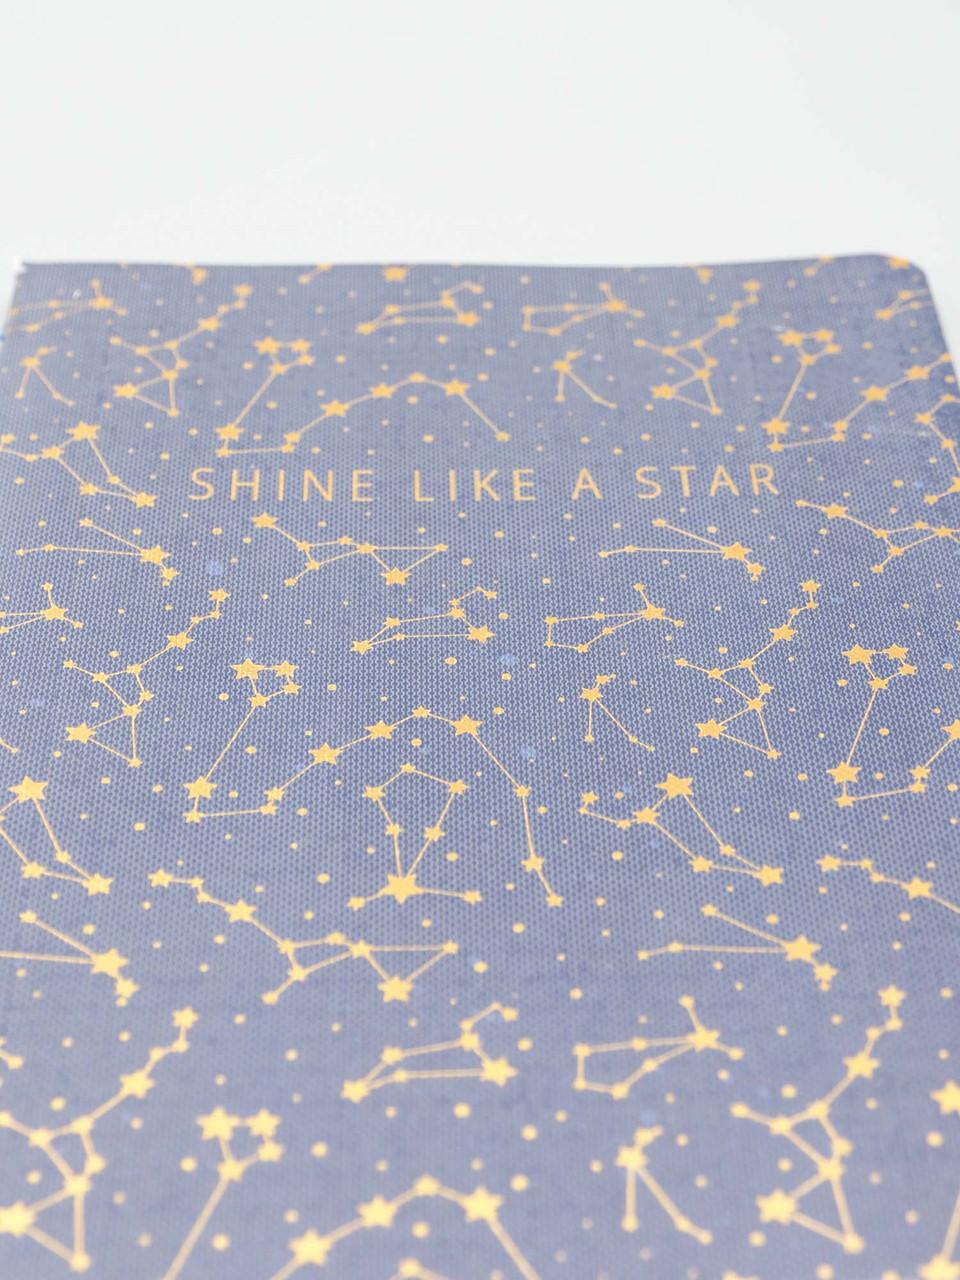 Shine like a star notebook studio oh